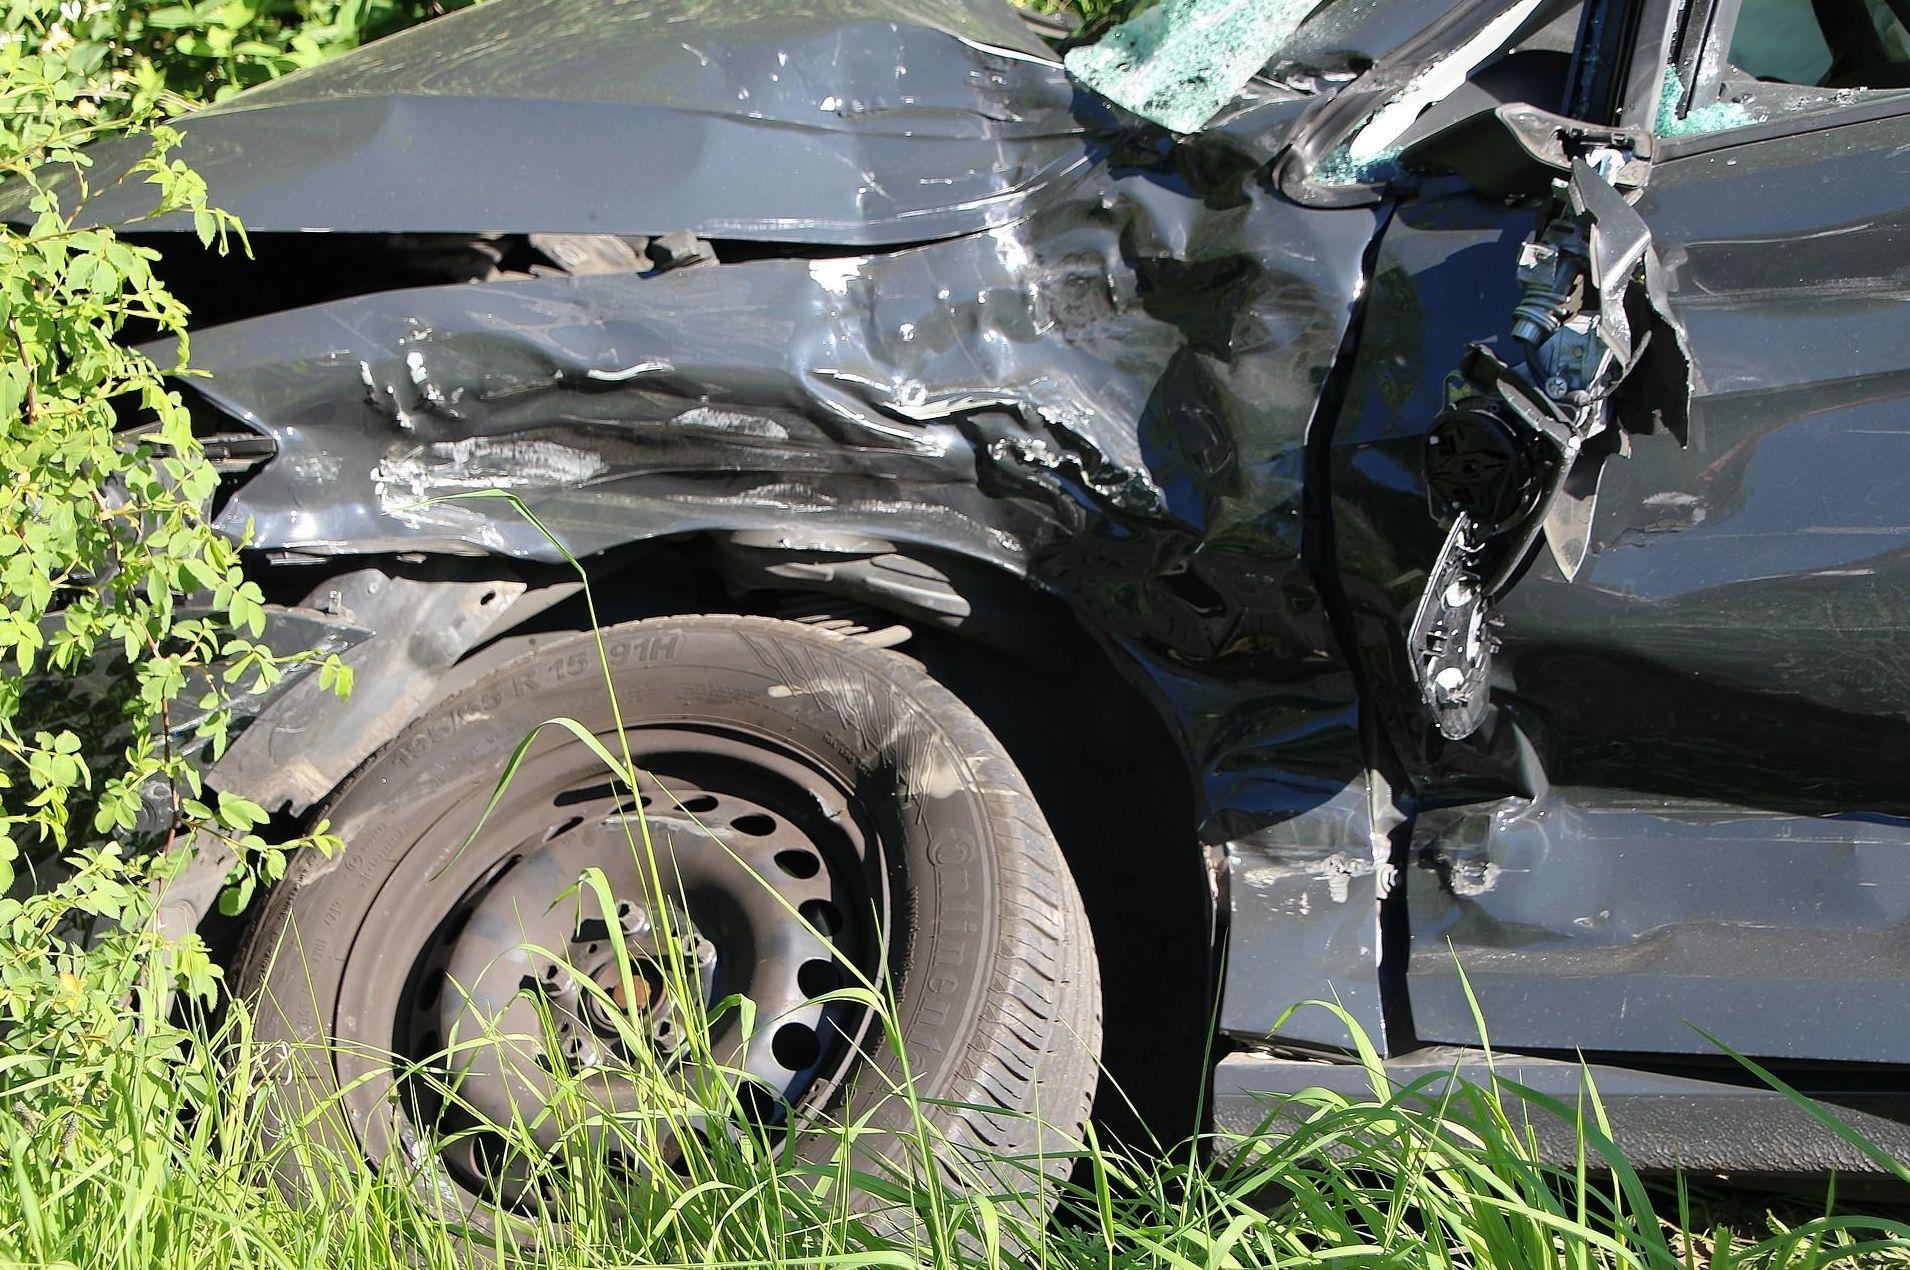 Accidentes de tráfico: Áreas de práctica de LB & LO                  López Bonilla & López de Oro  ABOGADOS